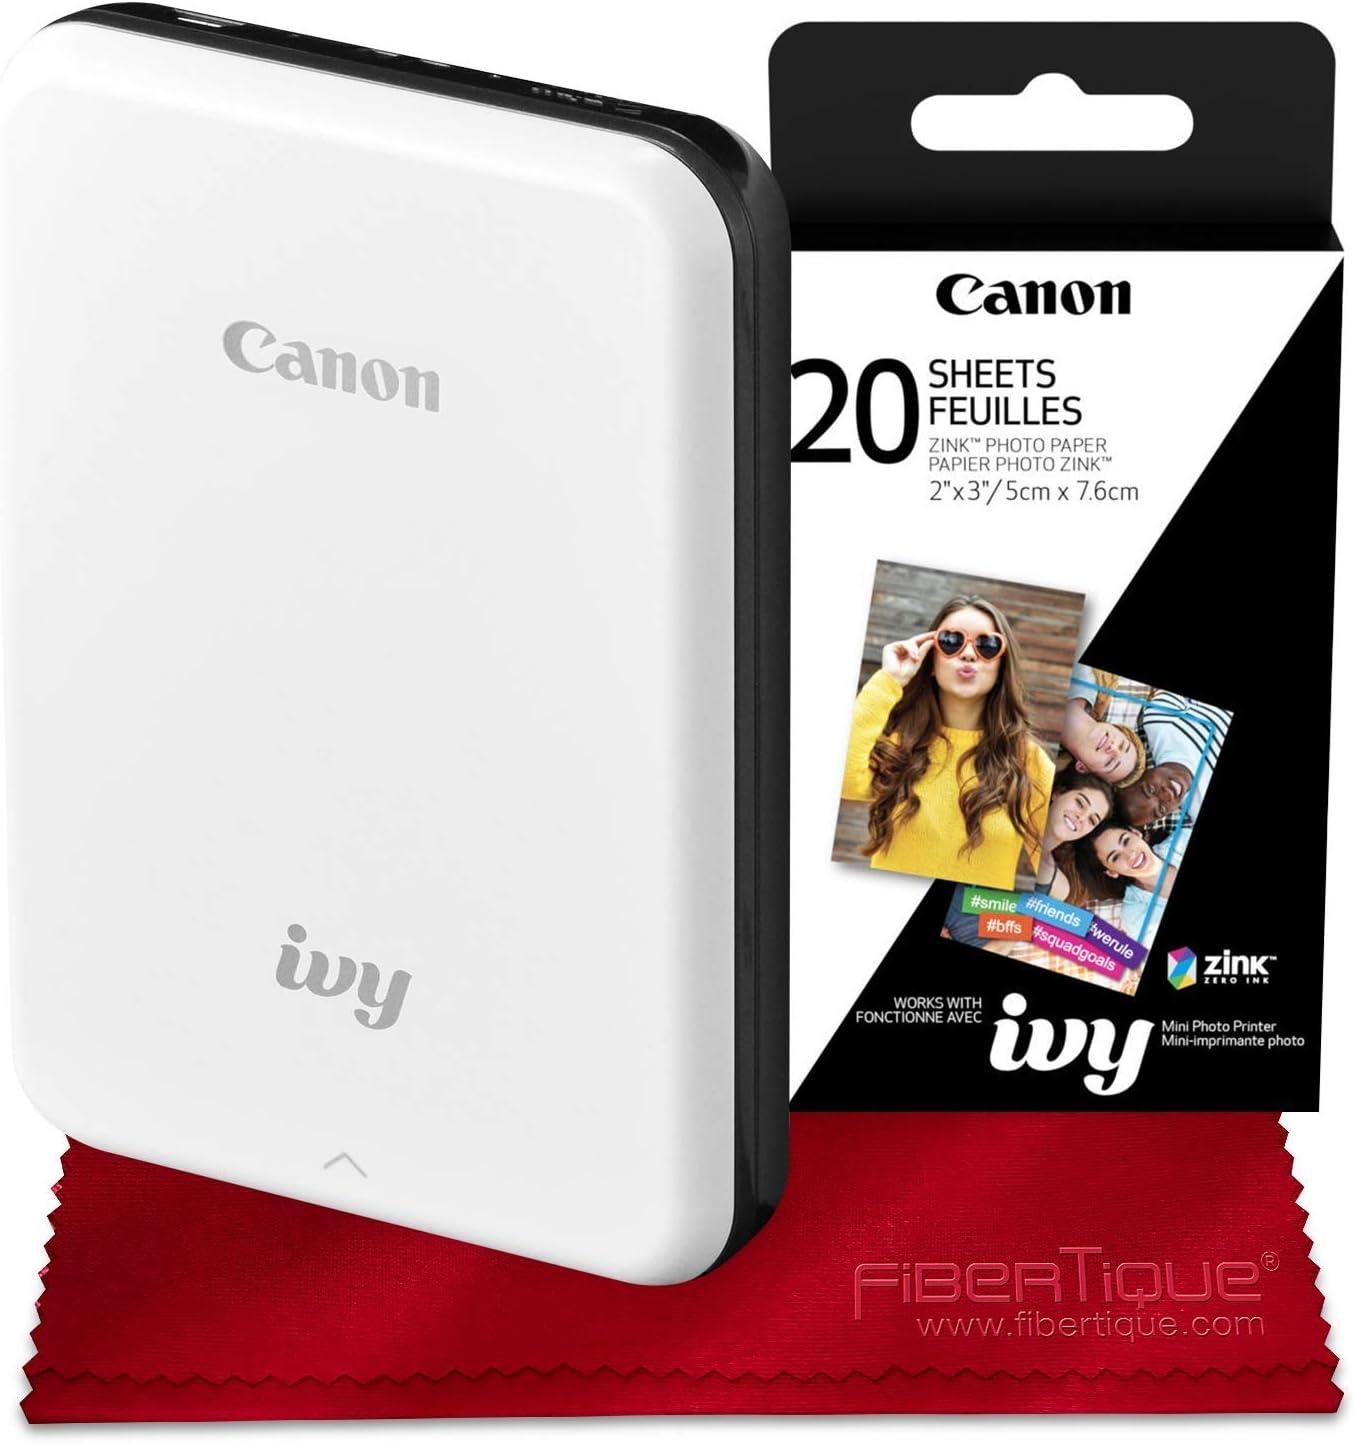 Slate Gray Canon Ivy Bluetooth Mini Mobile Photo Printer 2 x 3 Zink Photo Paper and Microfiber Cloth